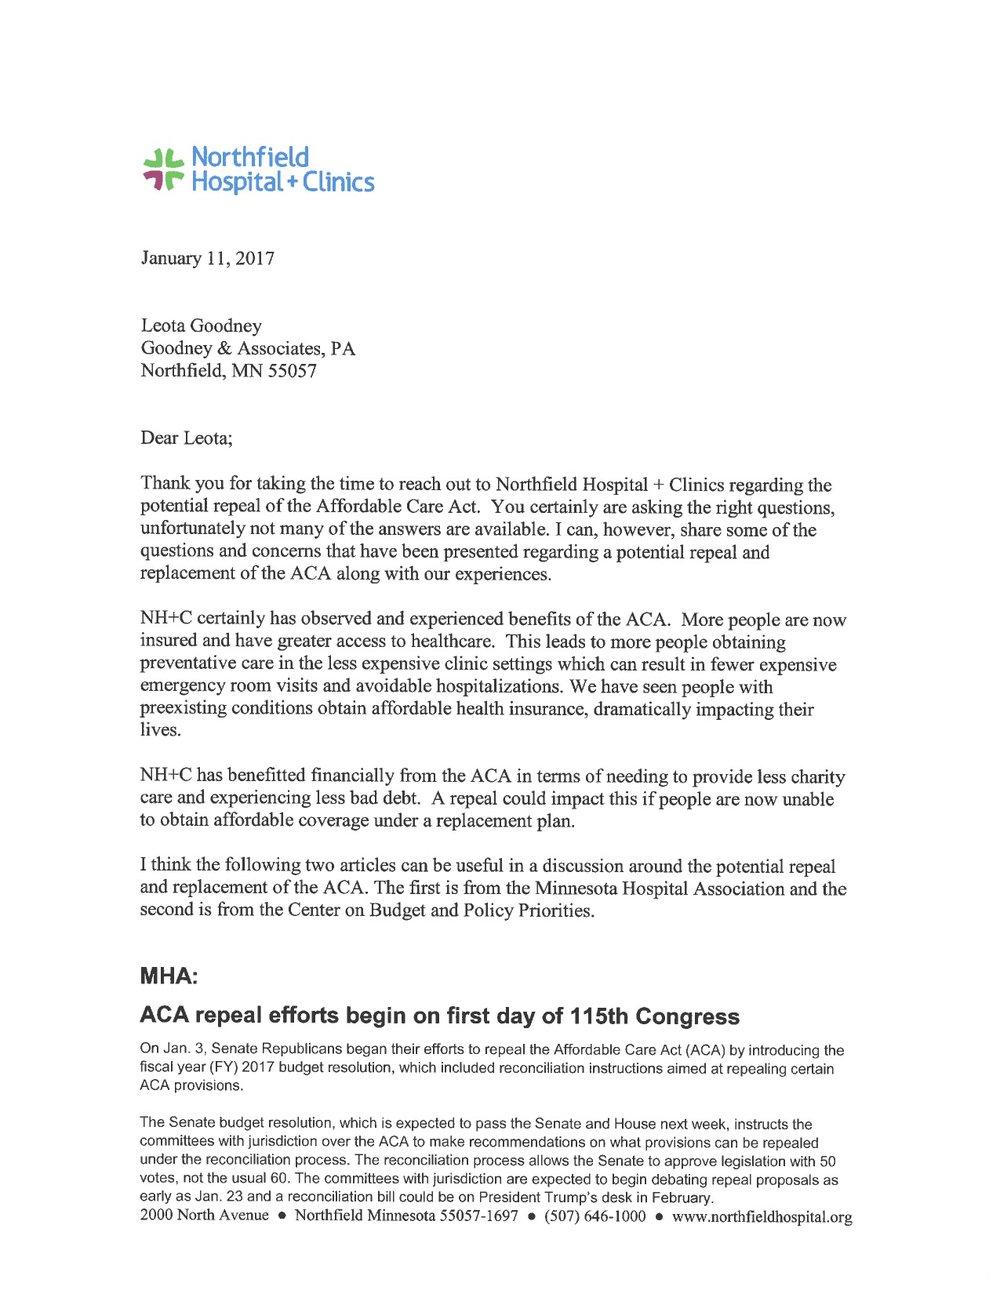 Ms L. Goodney ACA letter page 1.jpg